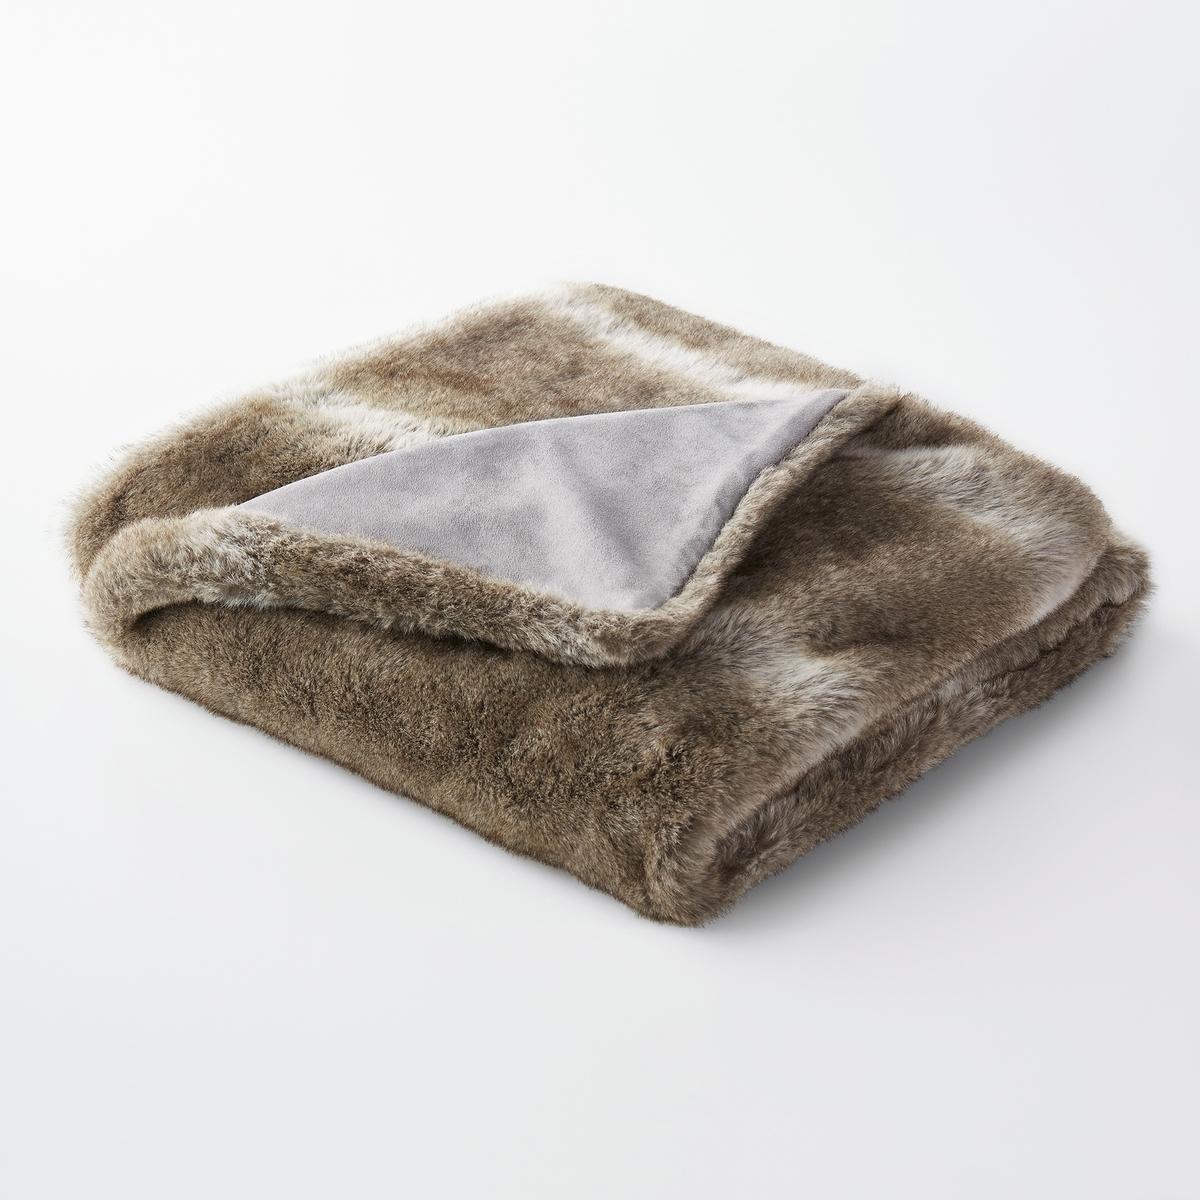 Плед BAZSO из искусственного меха подушка на стул из искусственного меха bazso